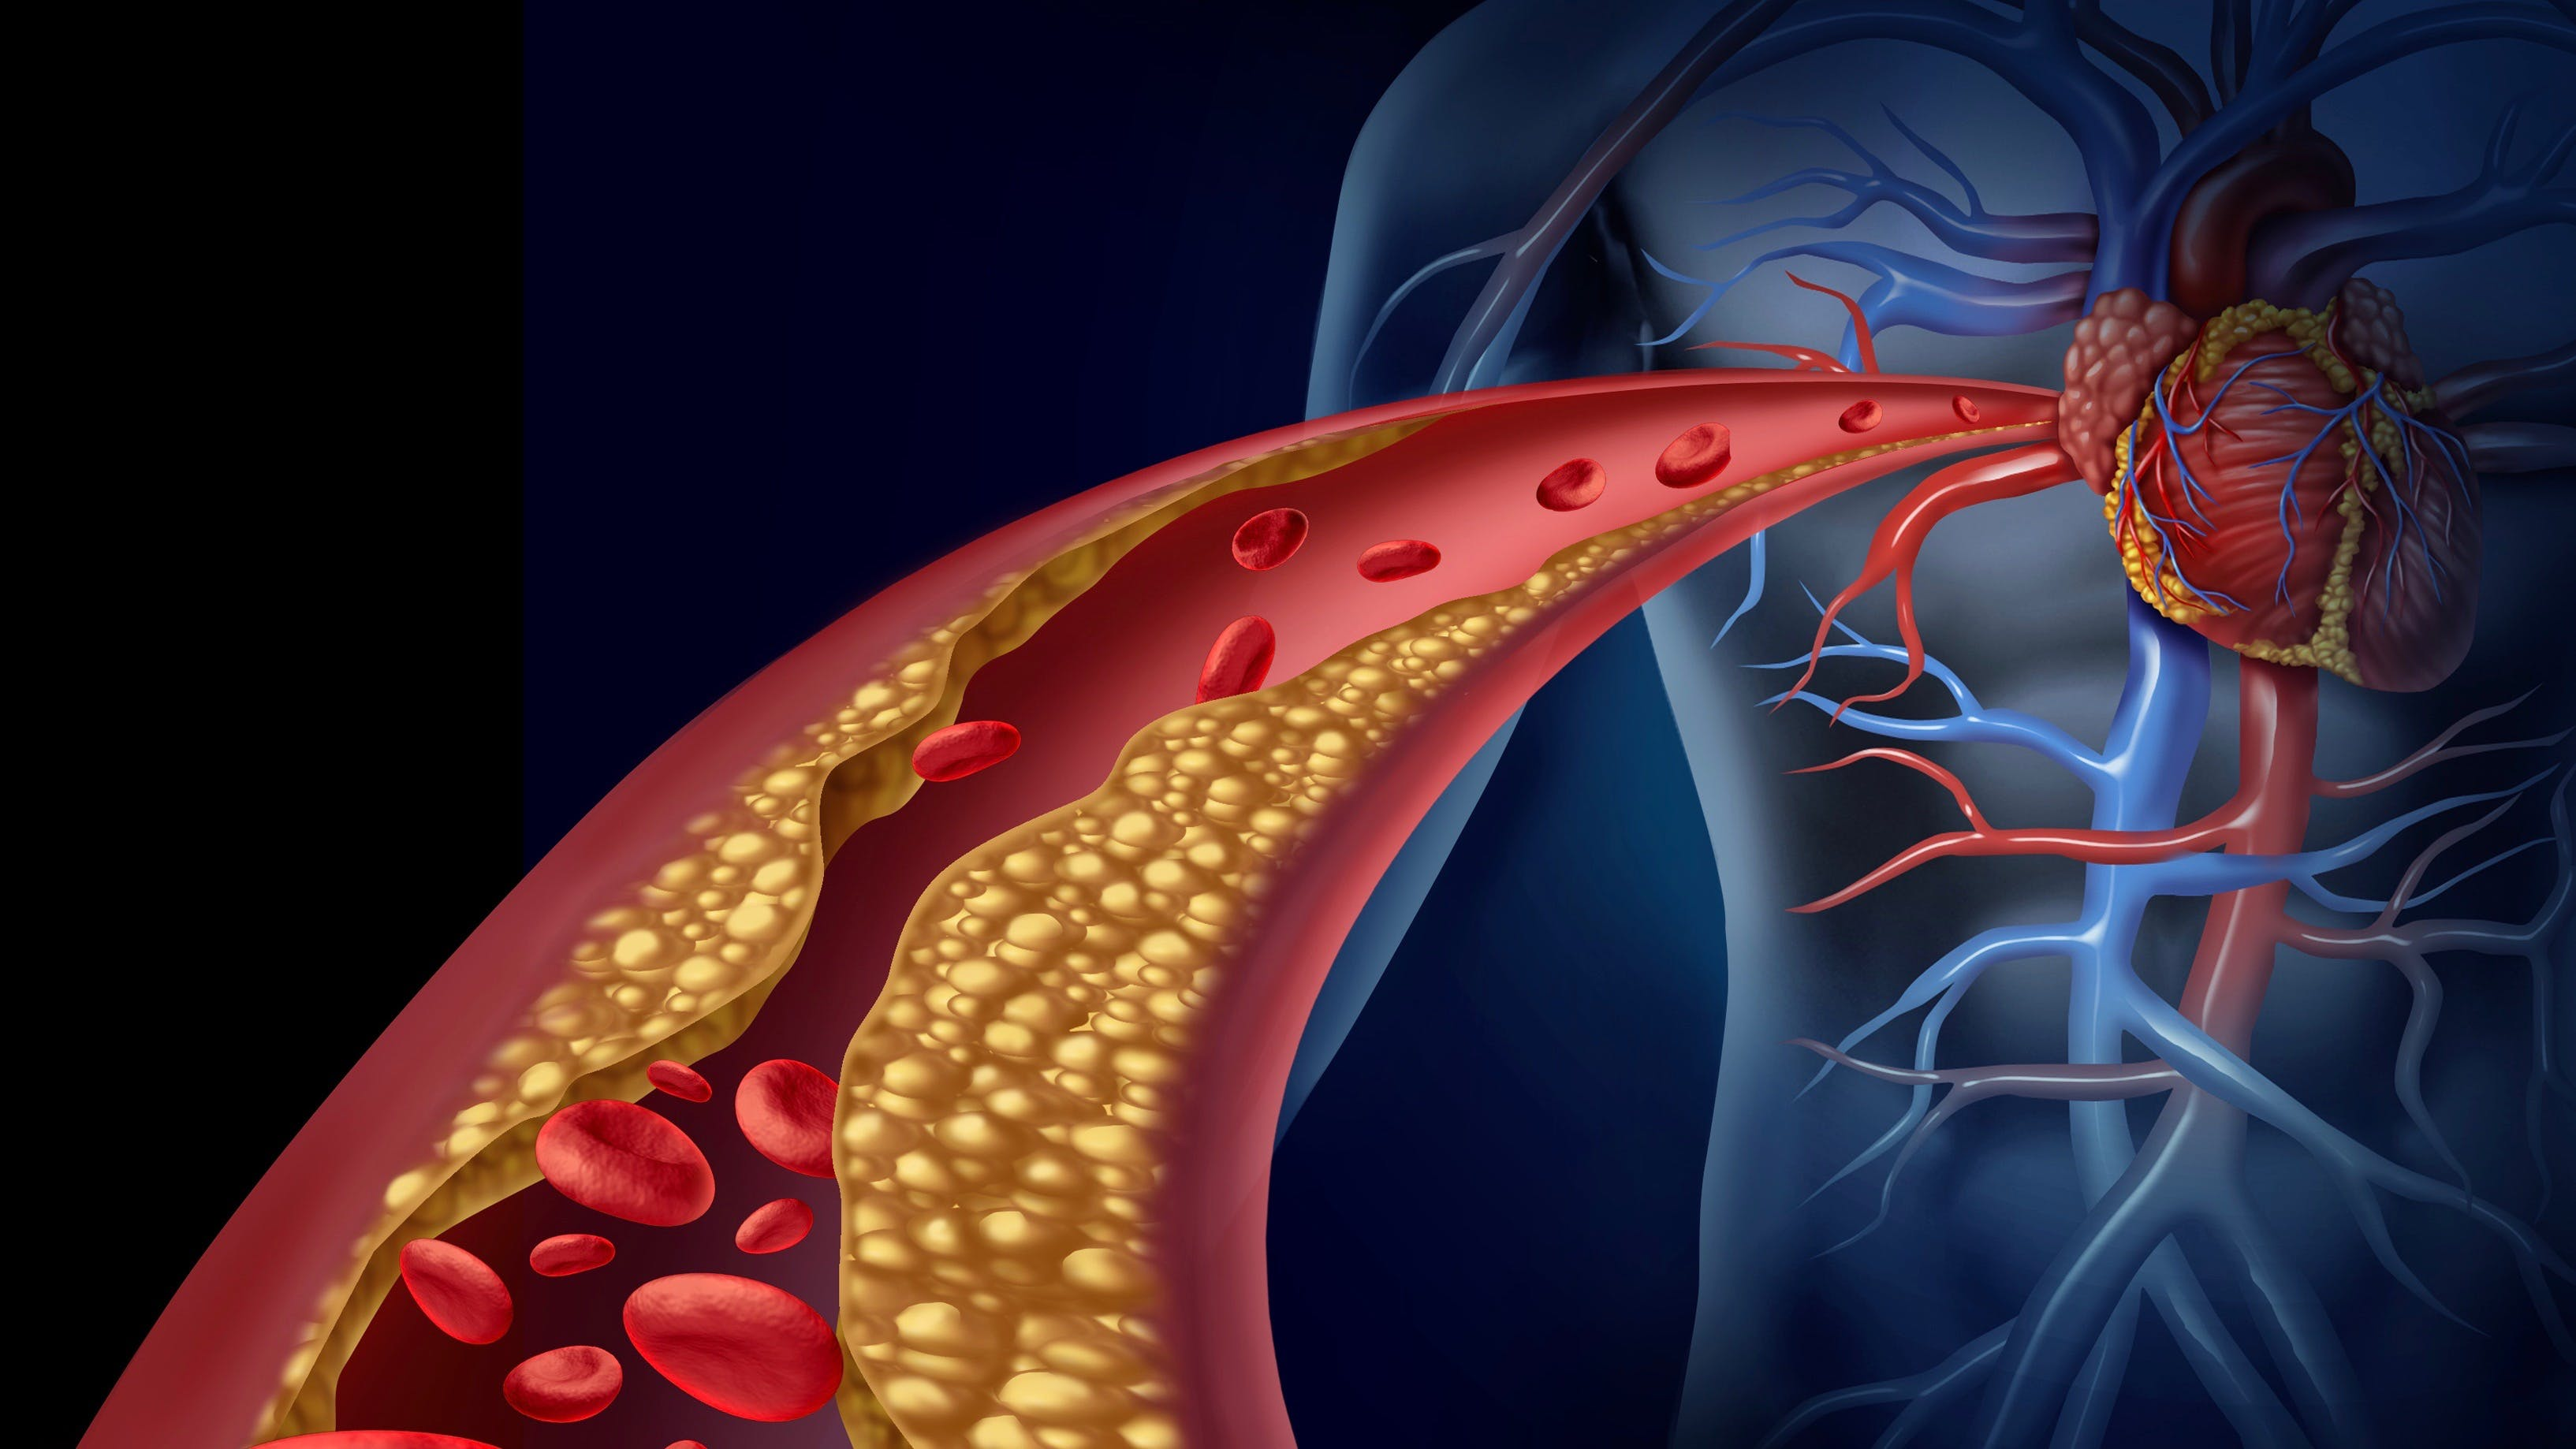 Arteria bloqueda